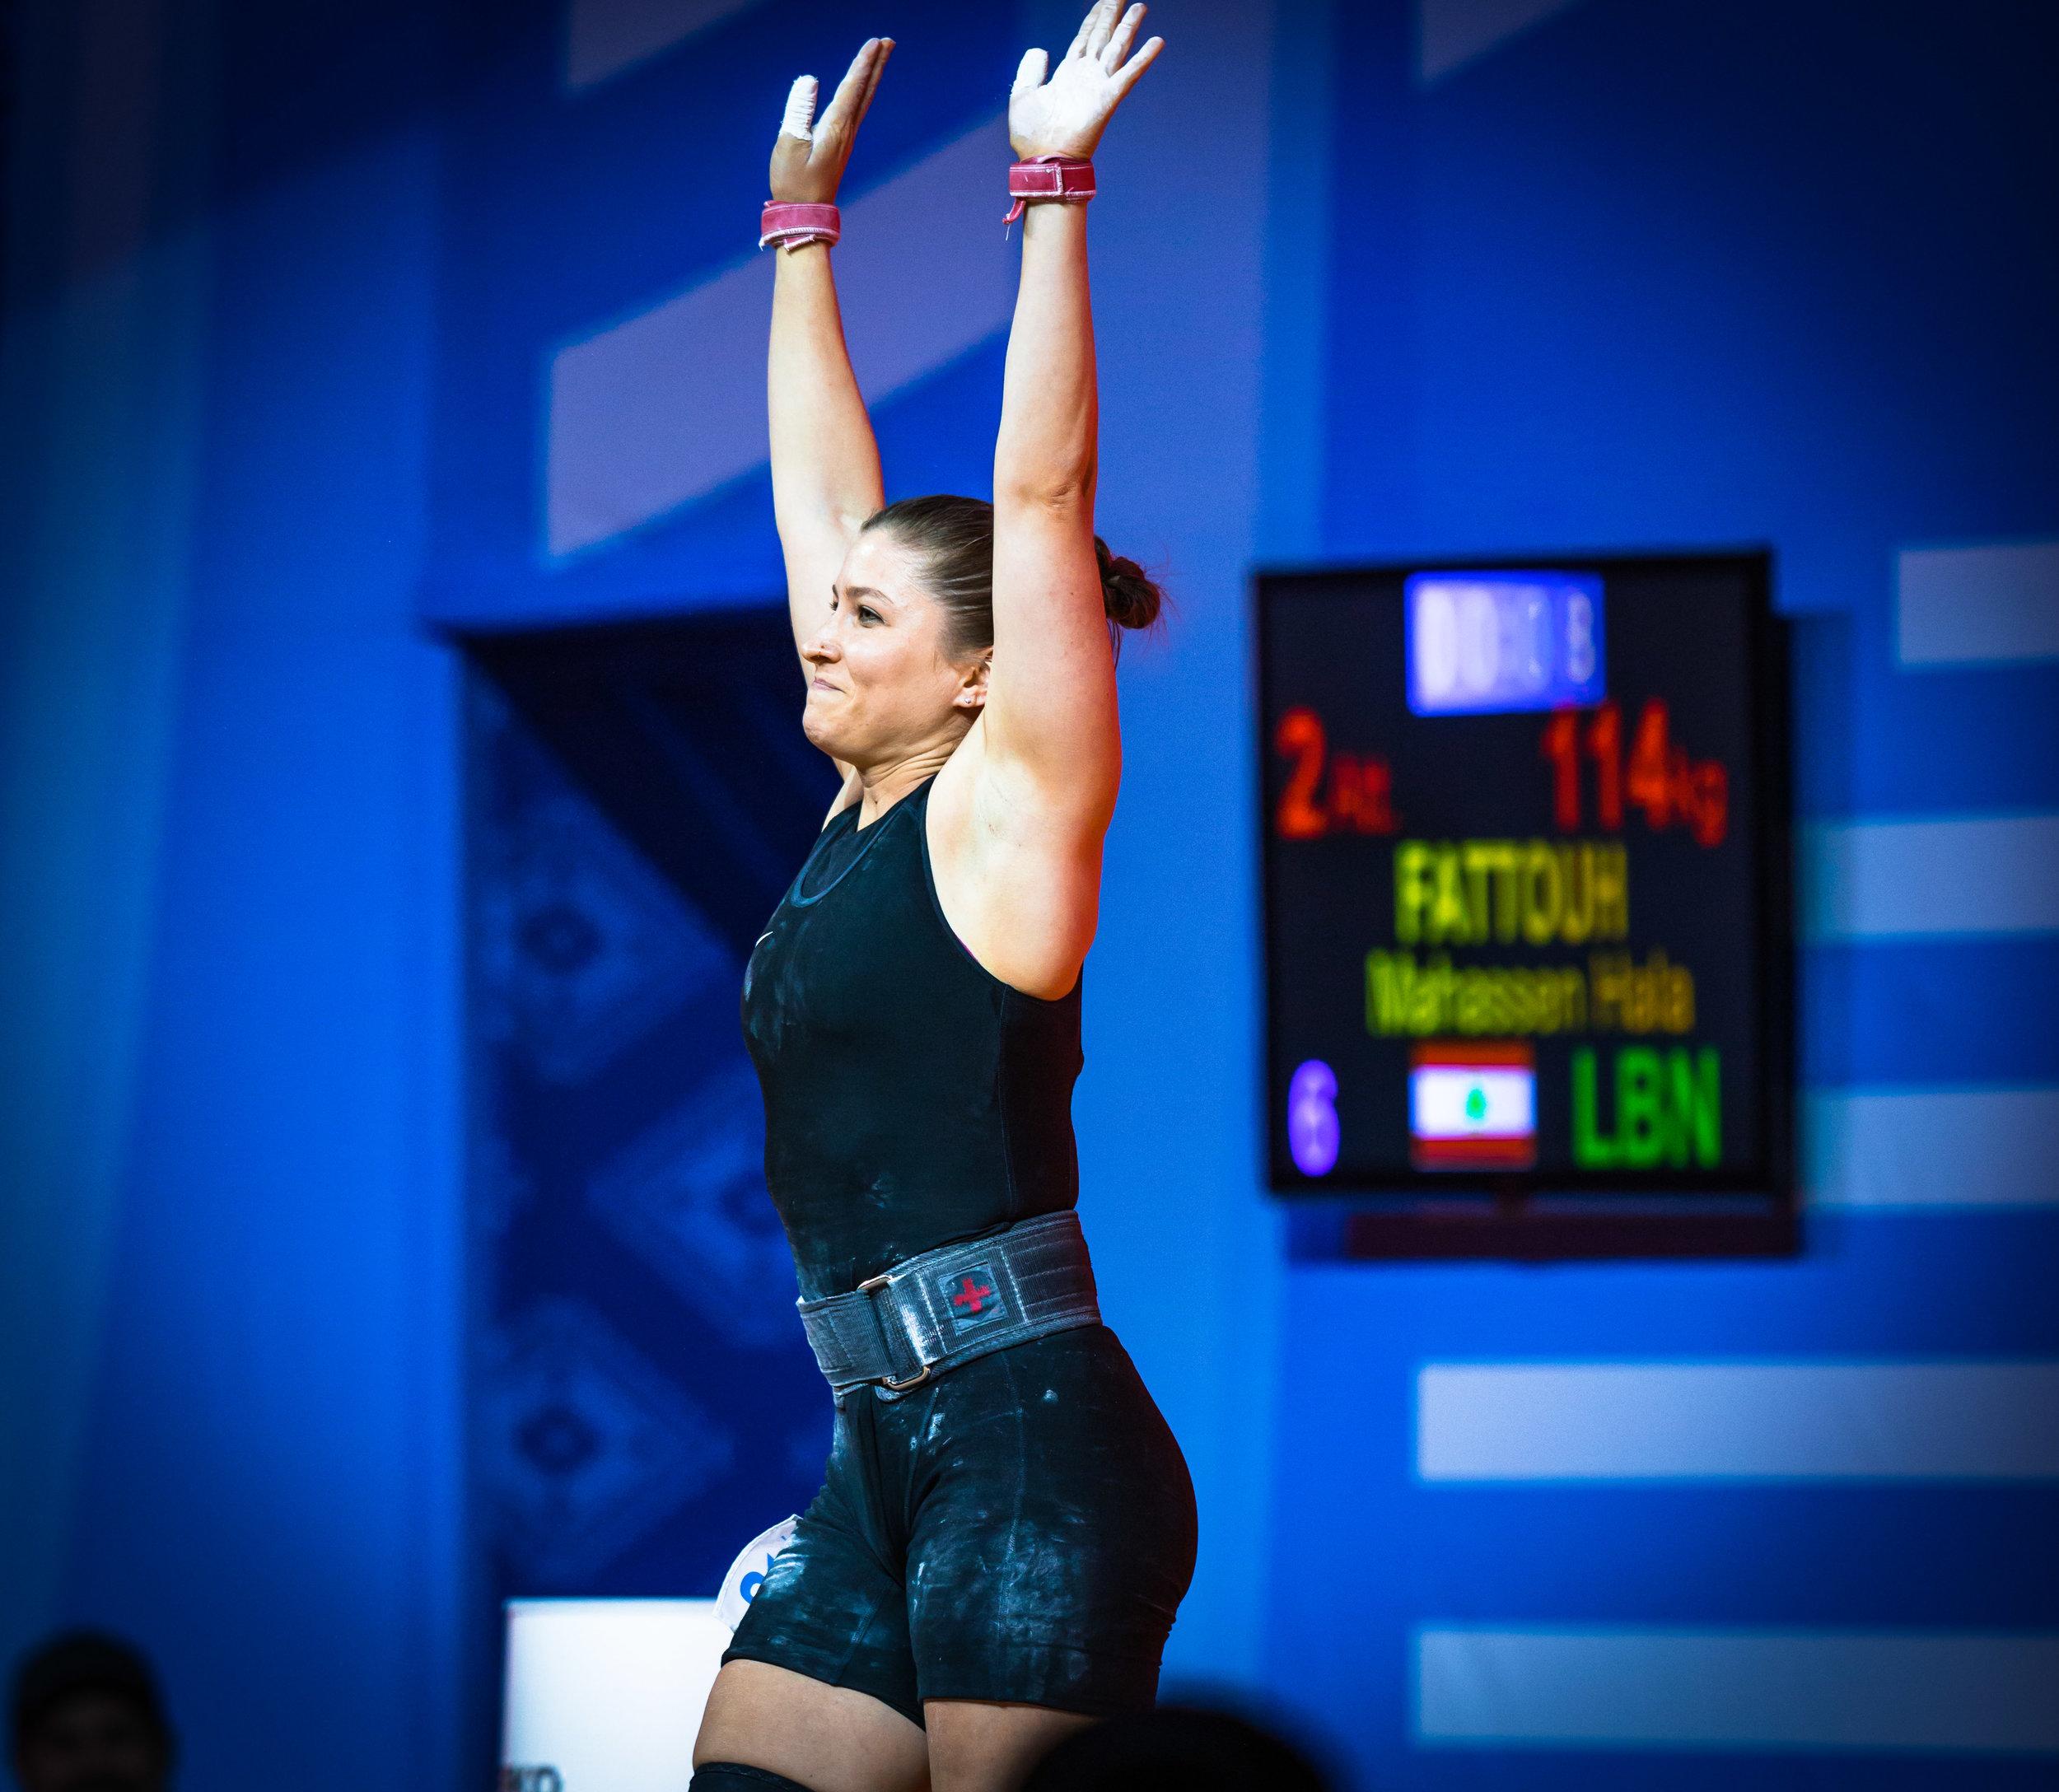 ashgabat-2018-world-weightlifting-championships-photos-by-viviana-podhaiski-weightlifting-photography-45.jpg